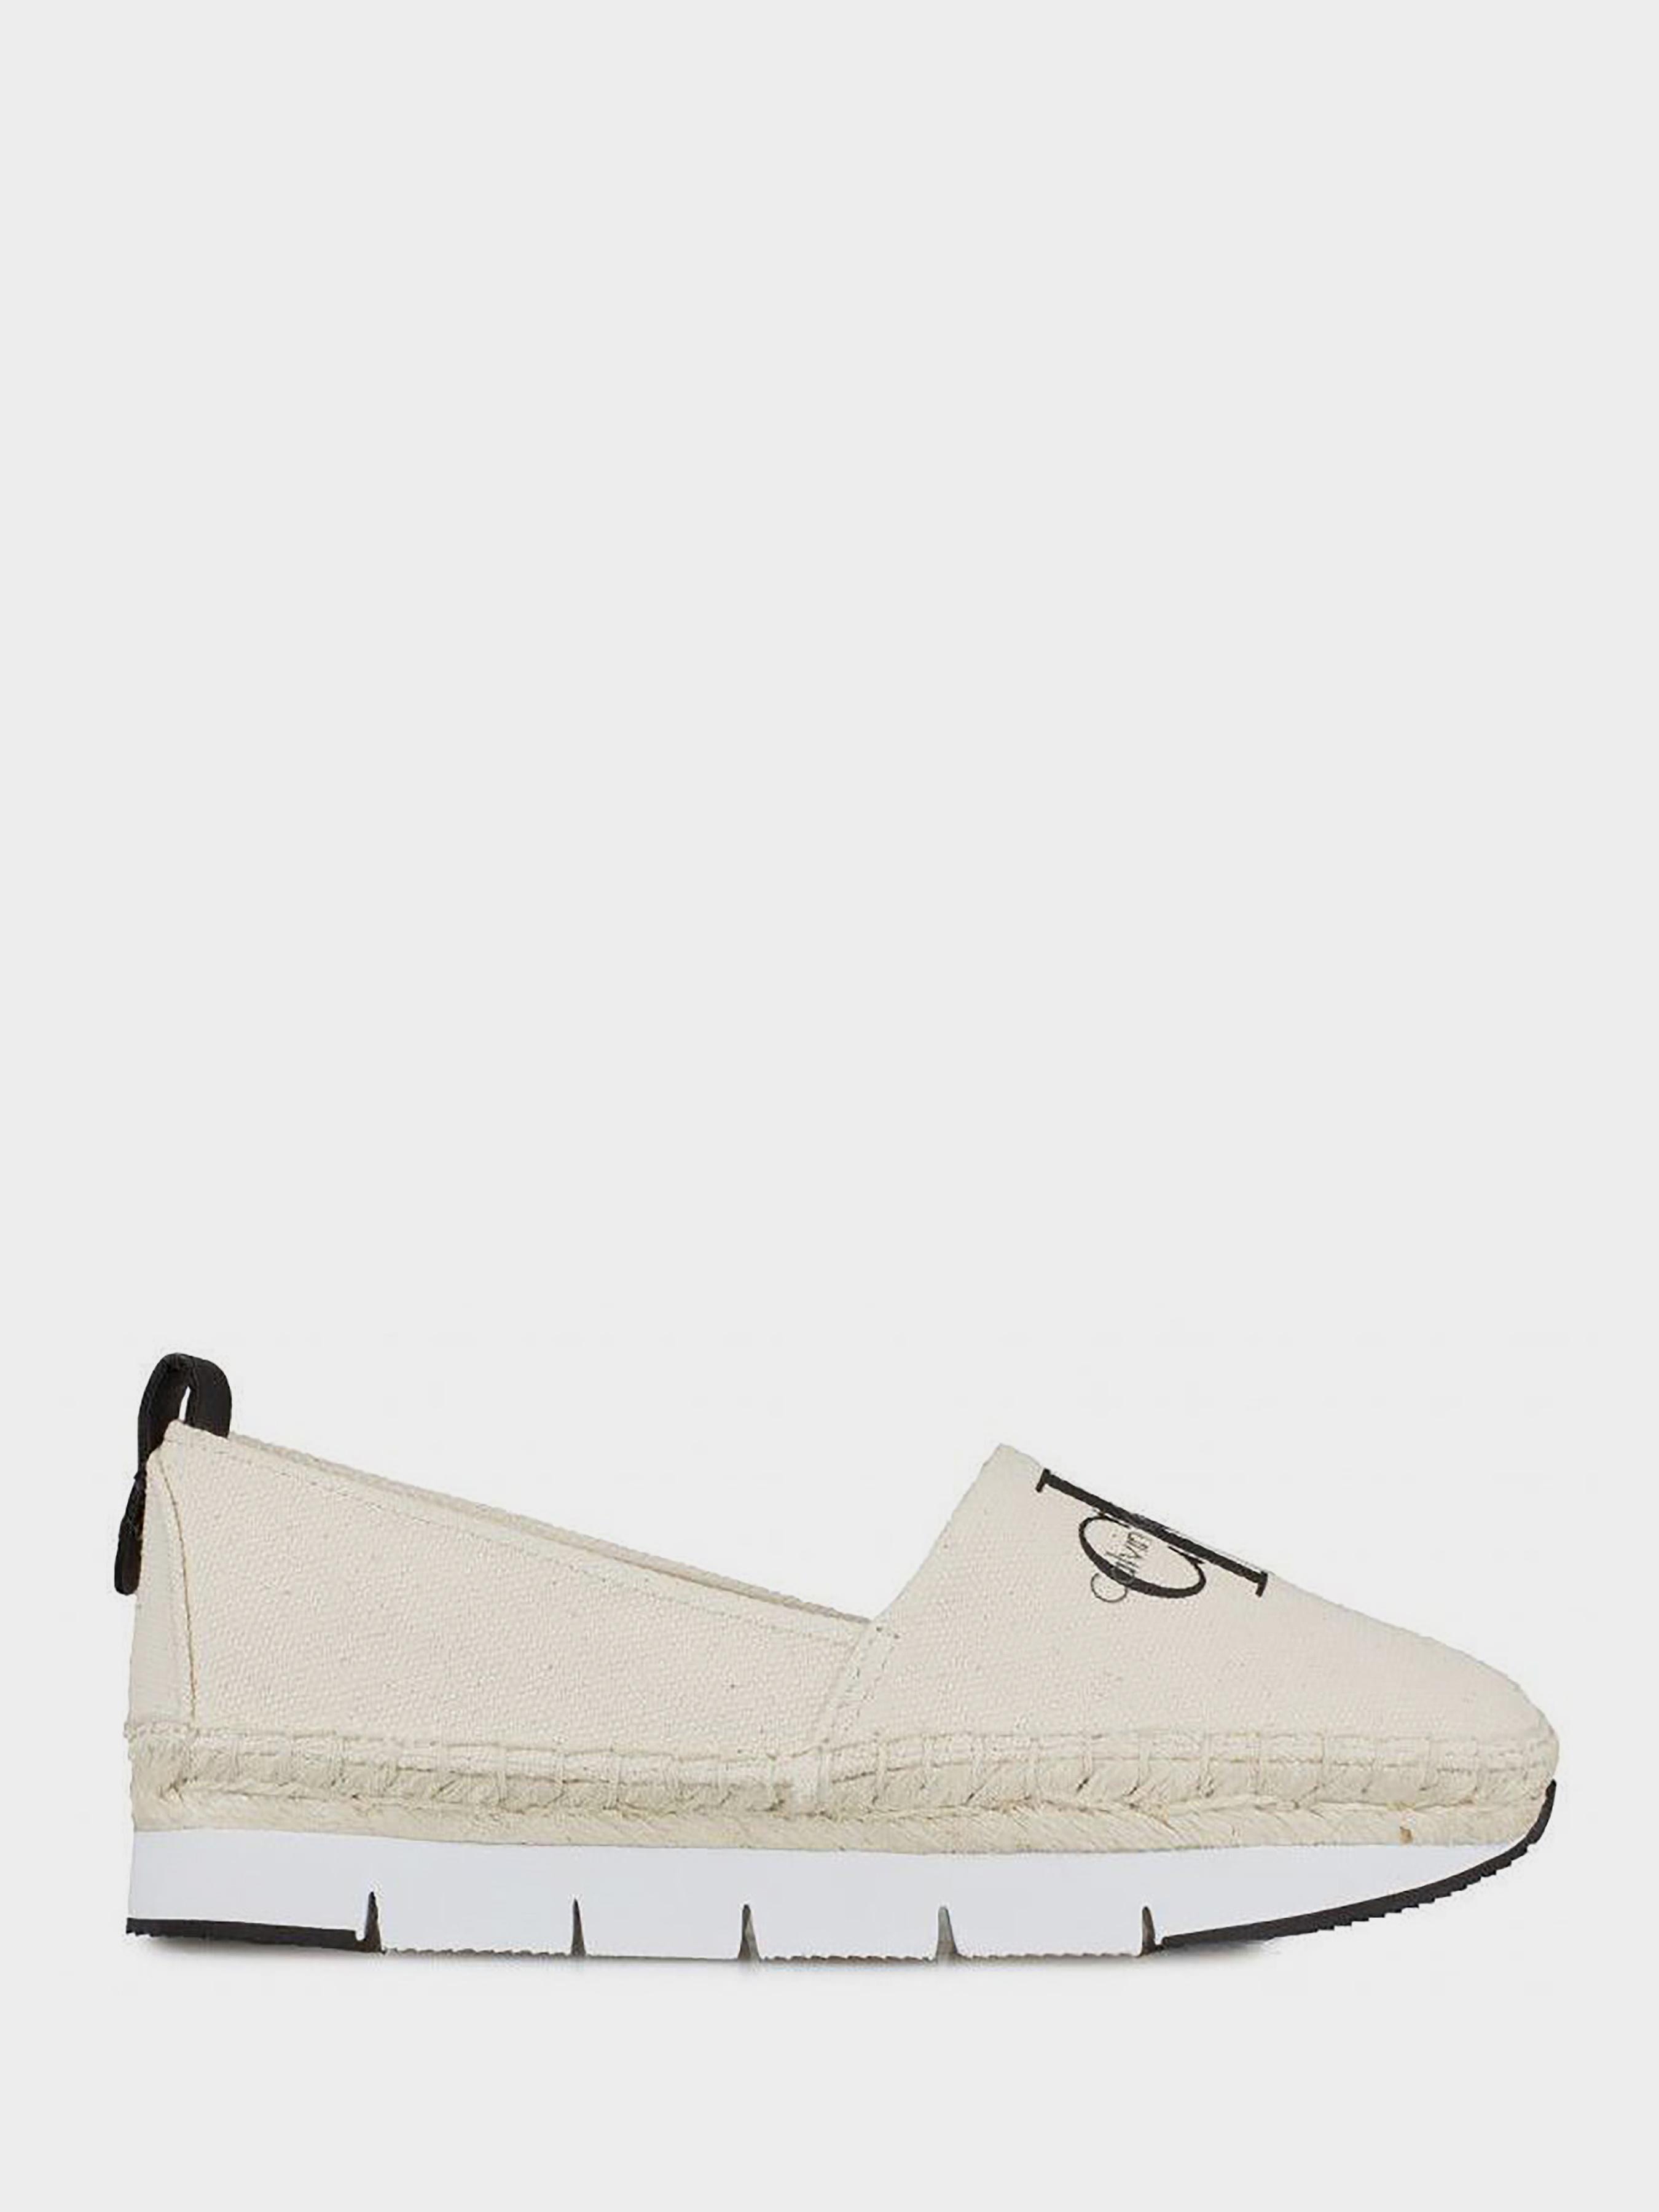 Слипоны для женщин Calvin Klein Jeans 3Y49 размеры обуви, 2017